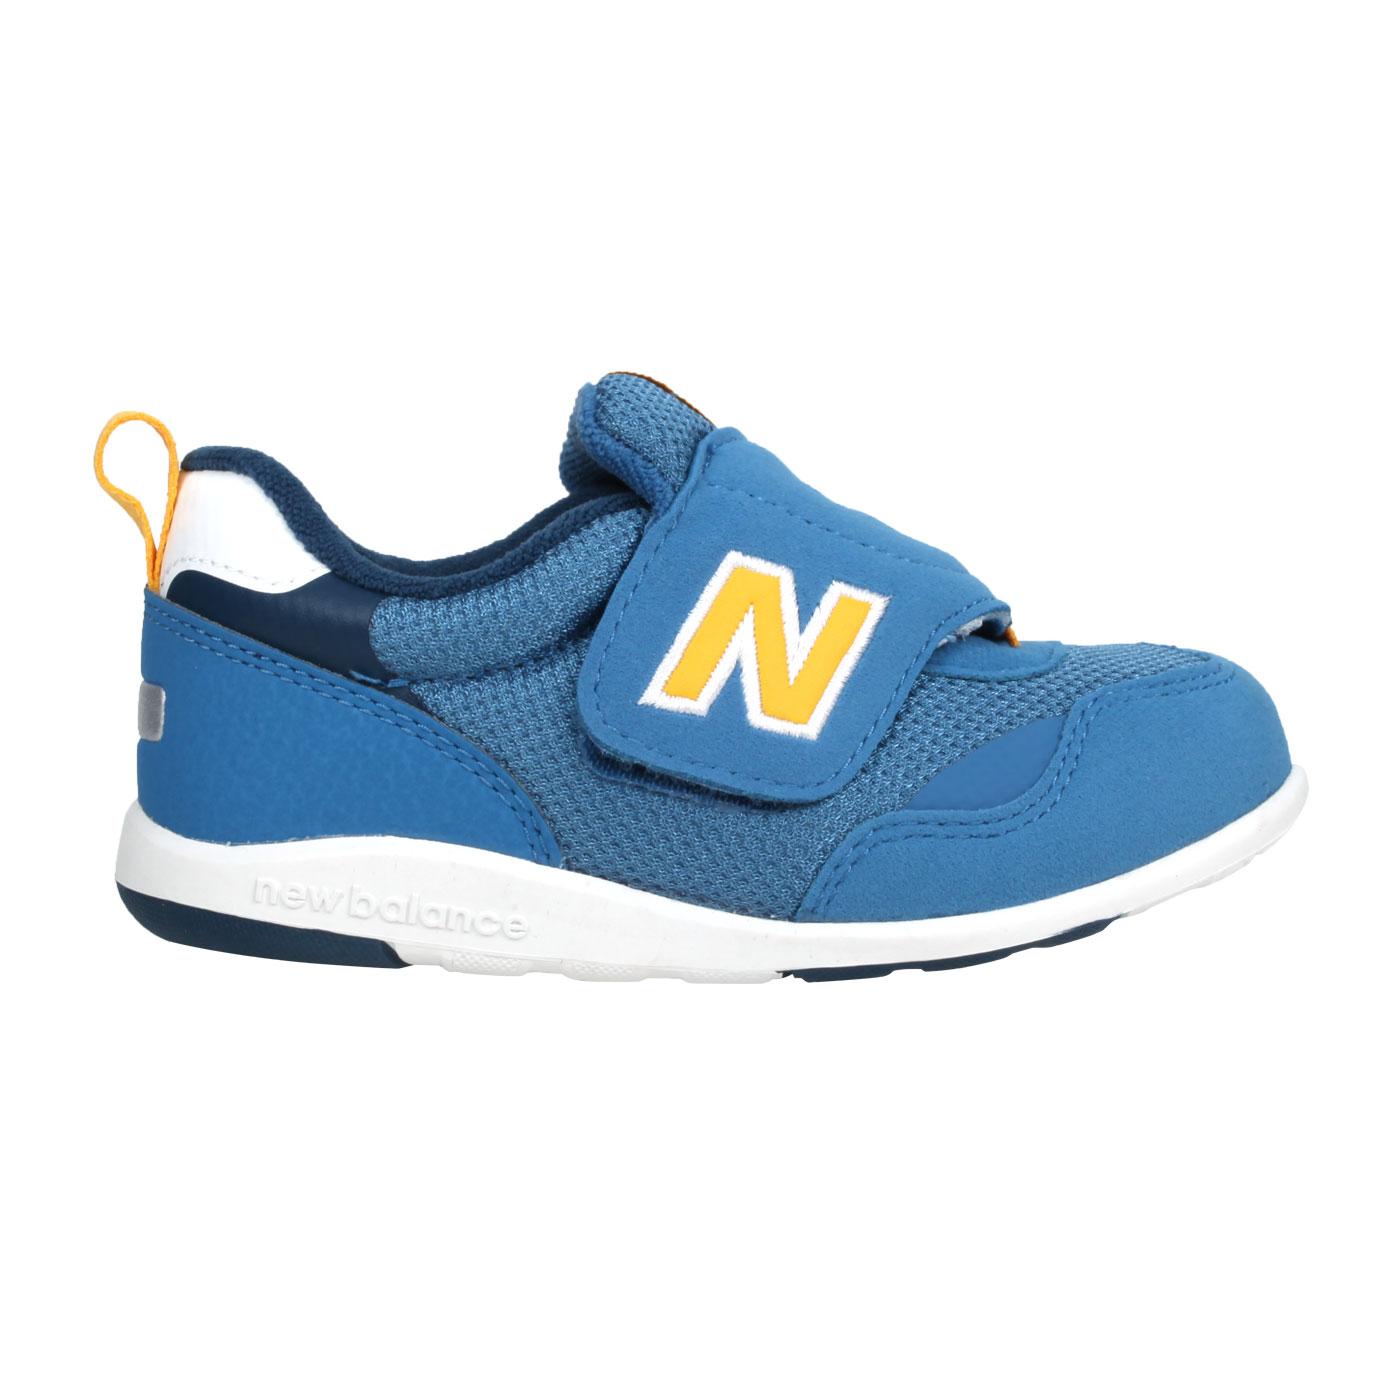 NEW BALANCE 小童復古慢跑鞋 IT313FBY - 珊瑚藍黃